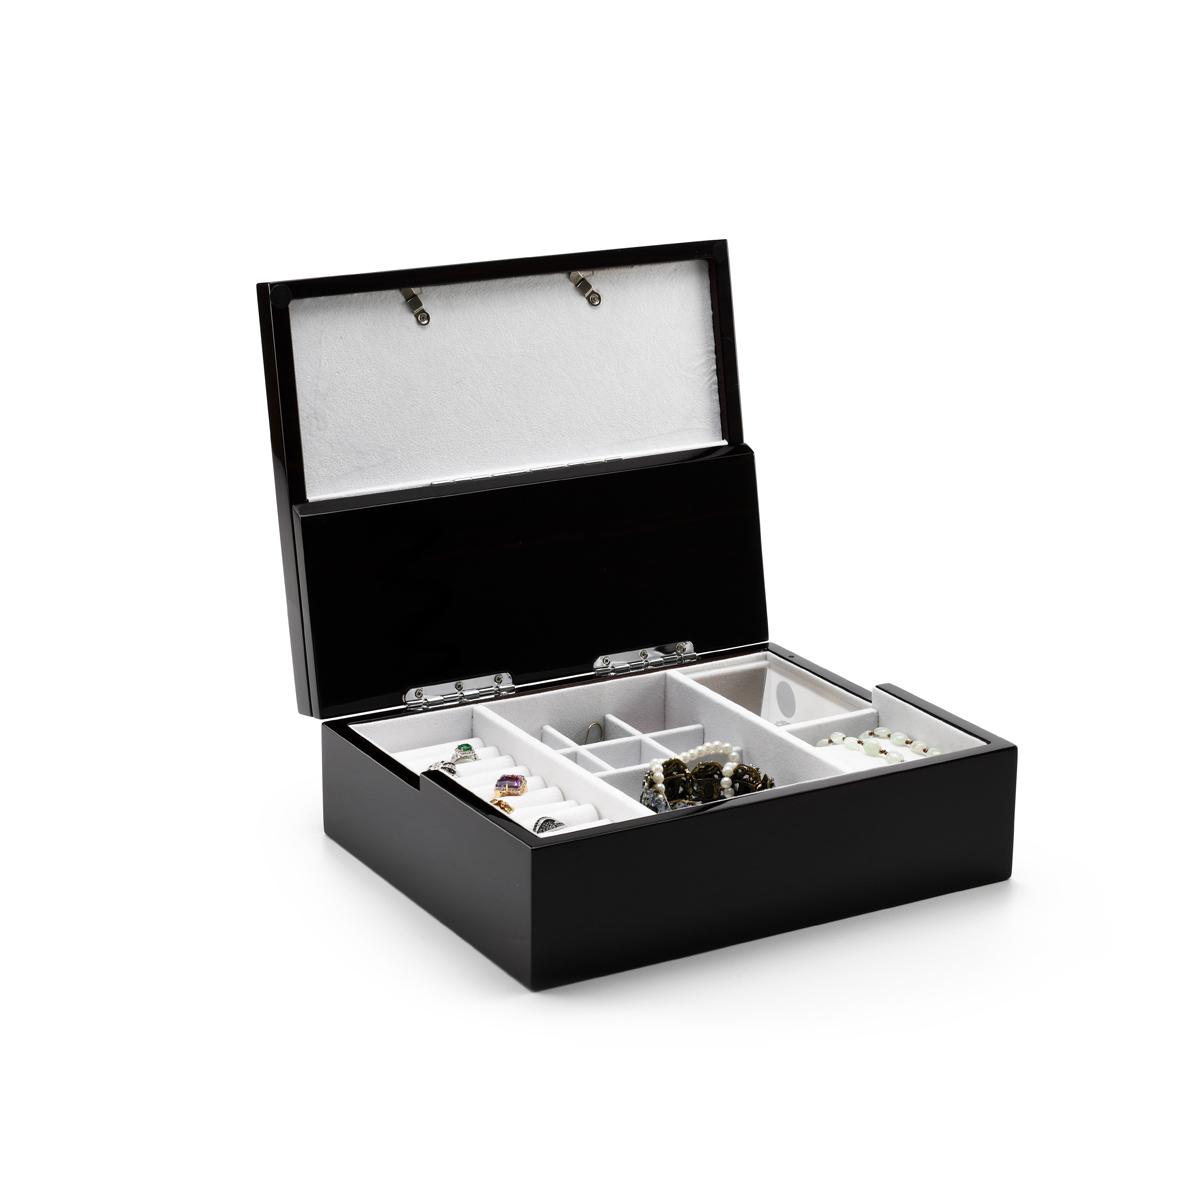 Ultra-Modern 10 x 8 22 Note Spacious Photo Frame Musical Jewelry Box